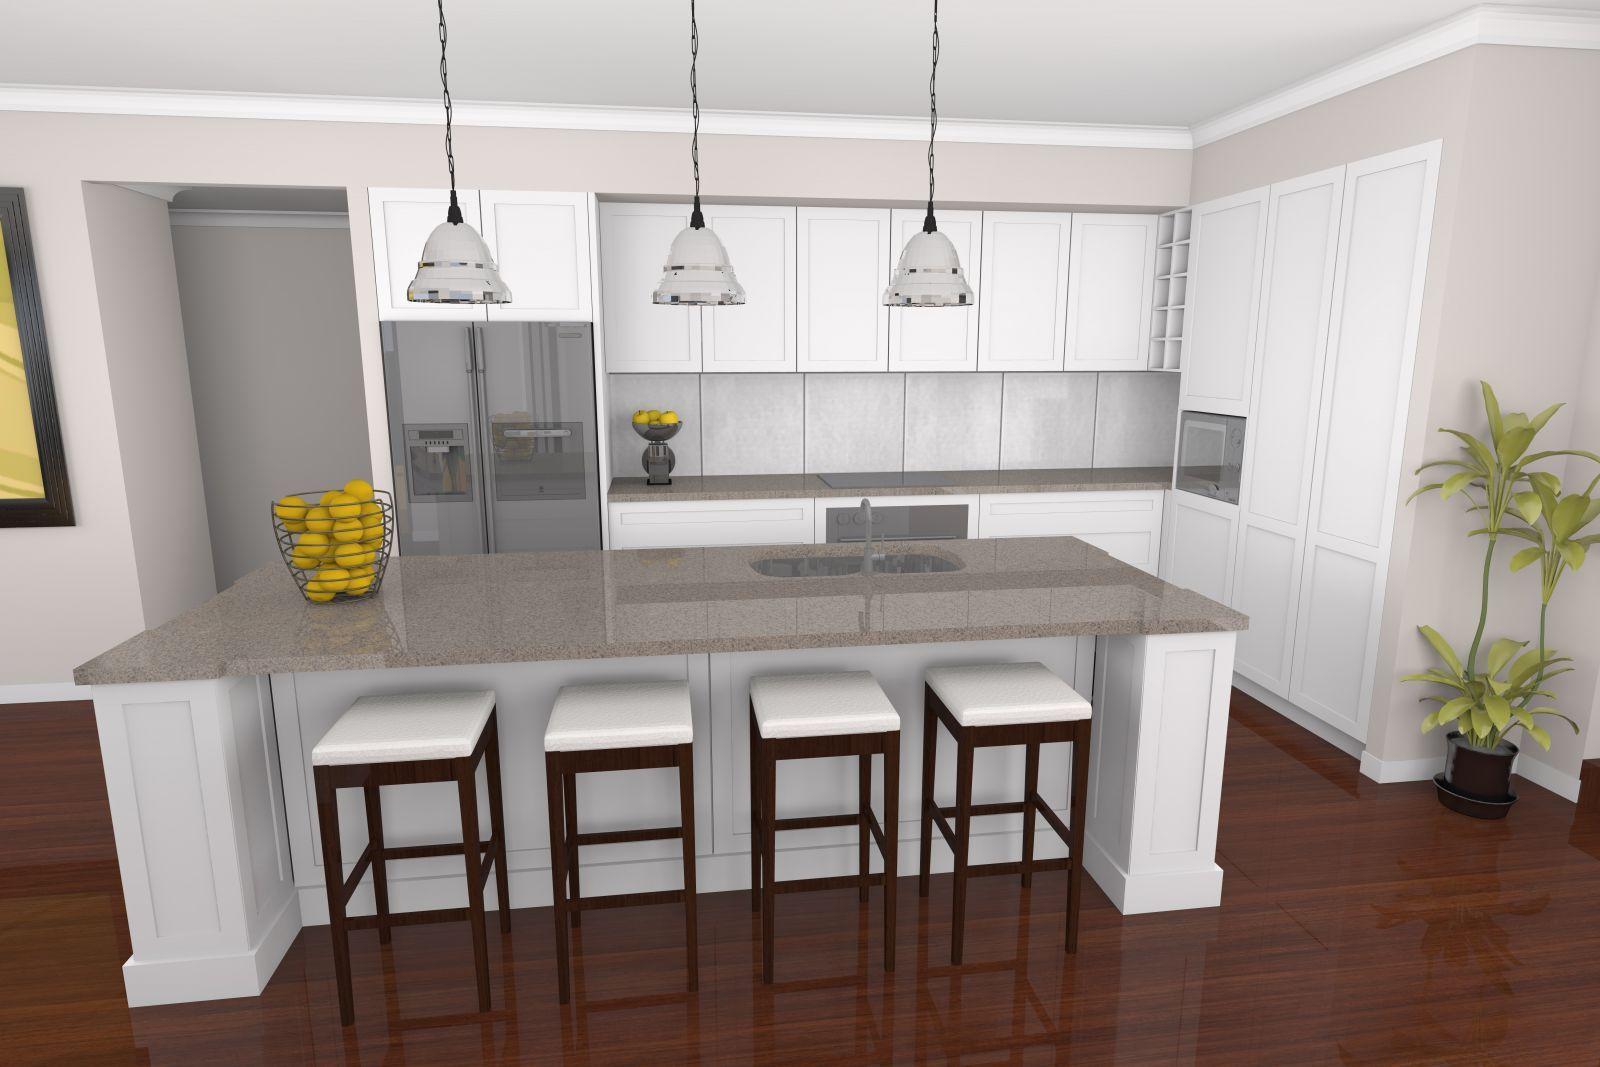 Ginger caesarstone kitchen google search countertops for Hamptons style kitchen splashback